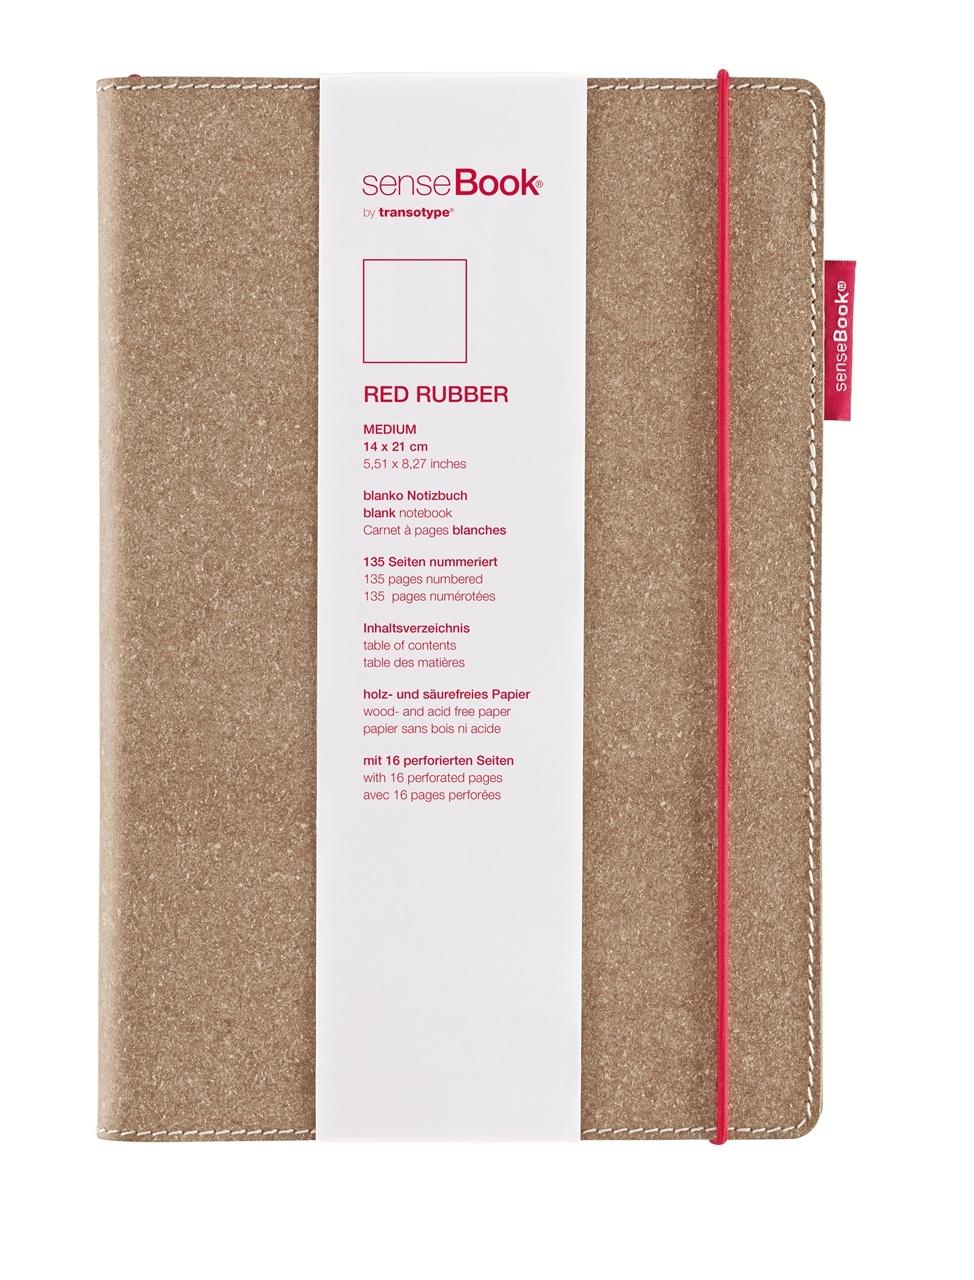 0015574_sensebook-red-rubber-a5-medium-blank